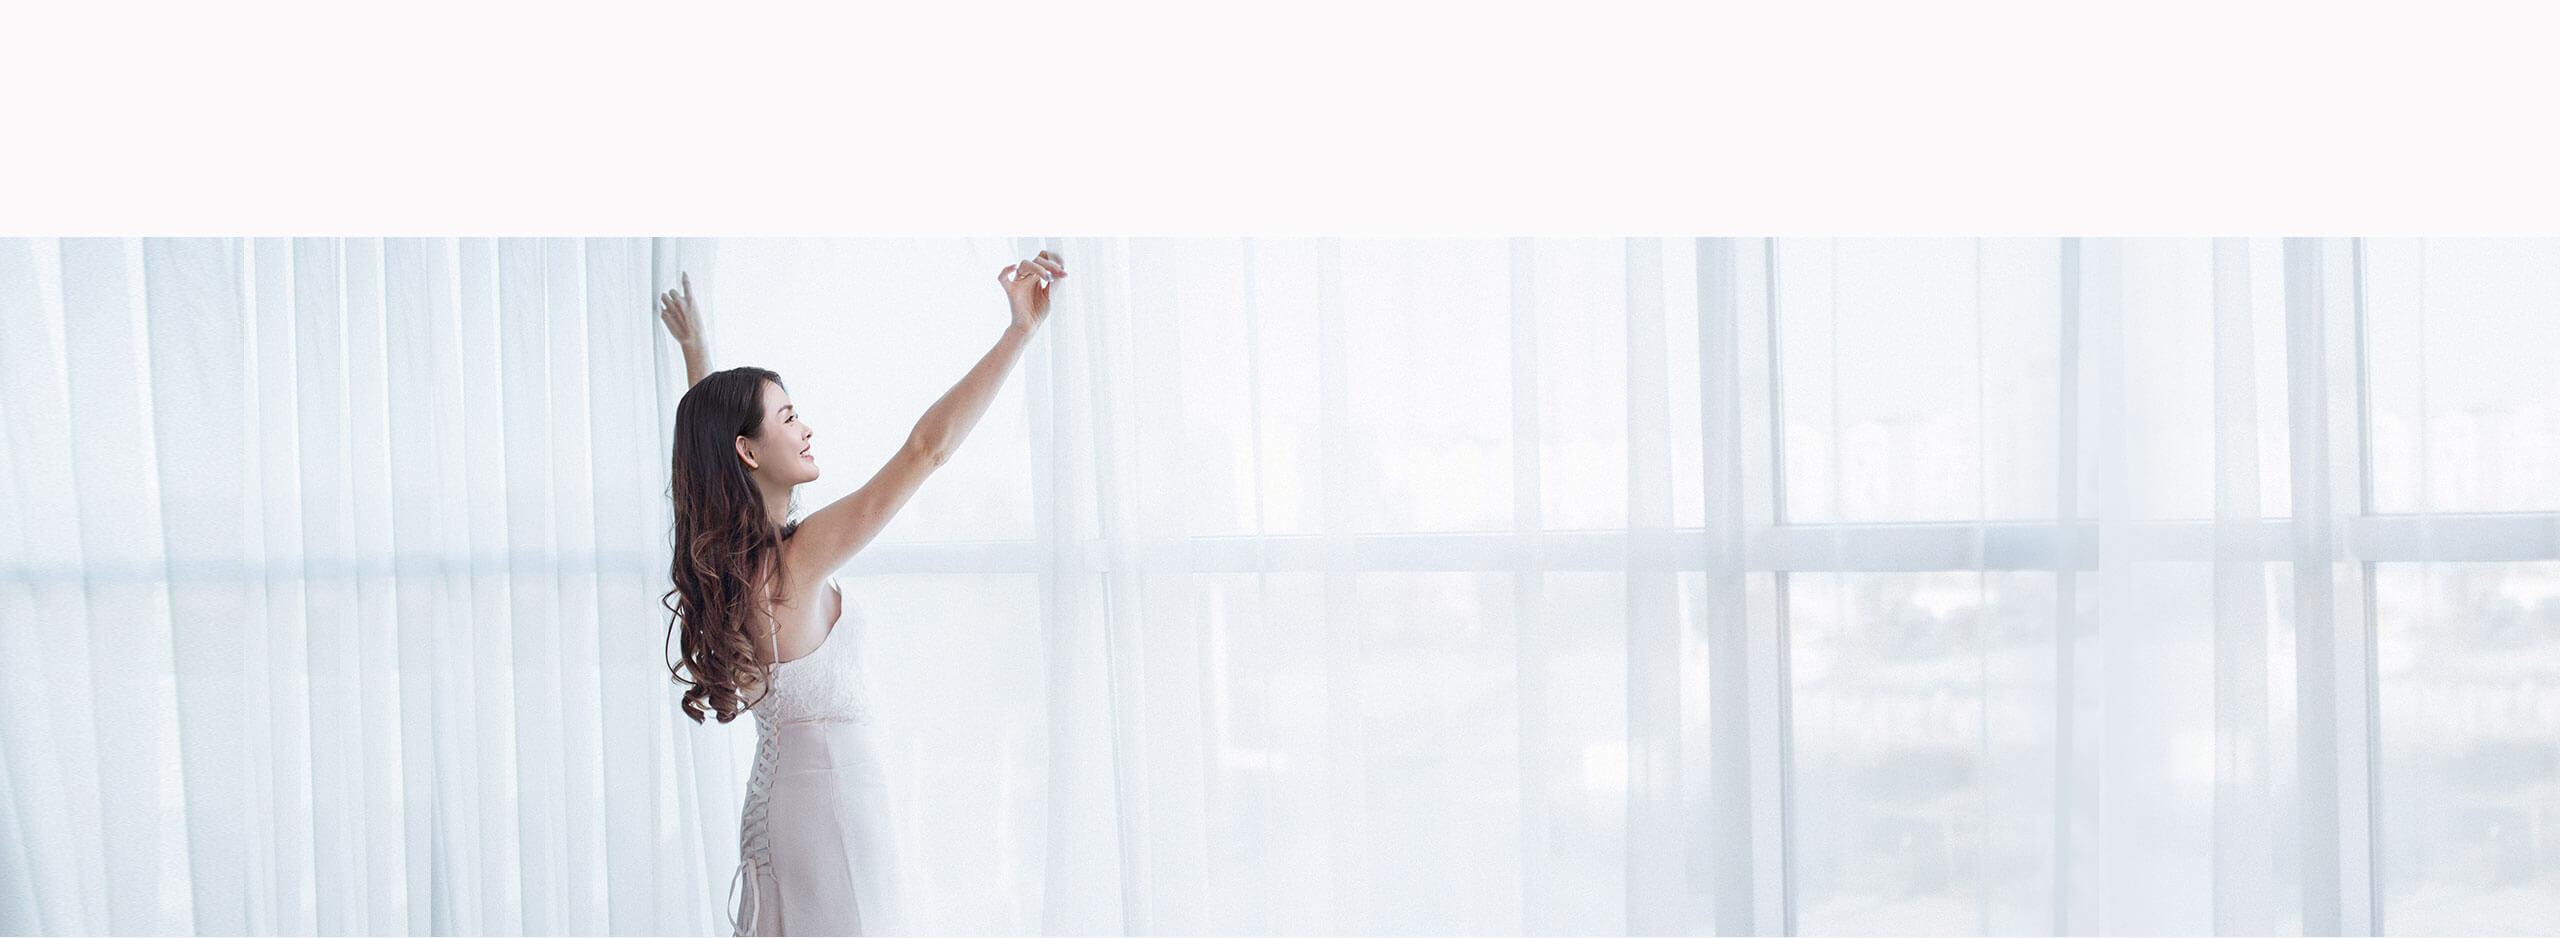 Aqara智能窗帘电机B1 - 全方位适用不同场景